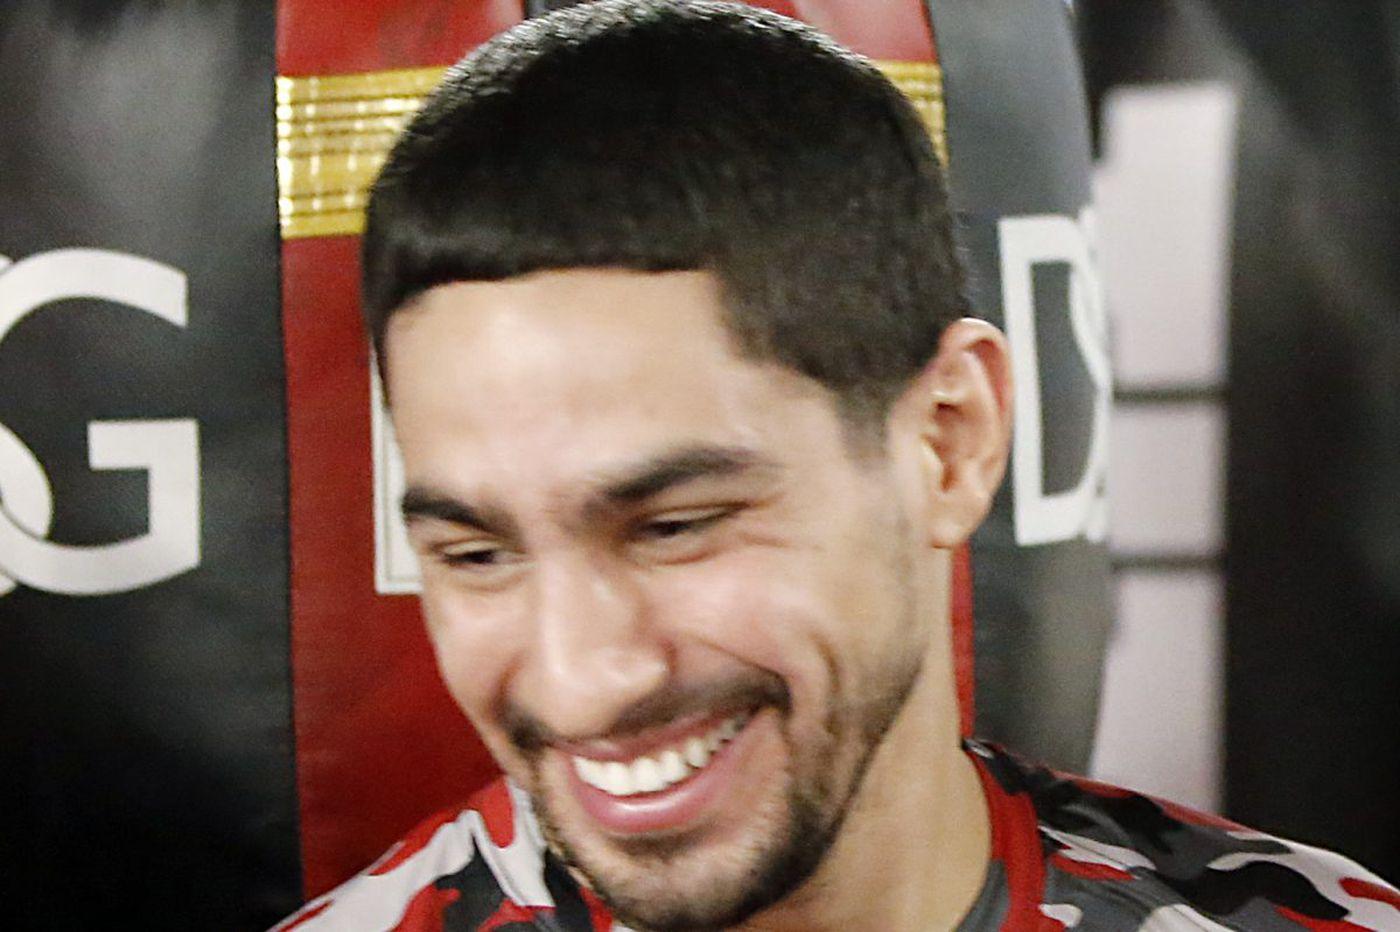 North Philadelphia's Danny Garcia's win over Rios puts him in demand again